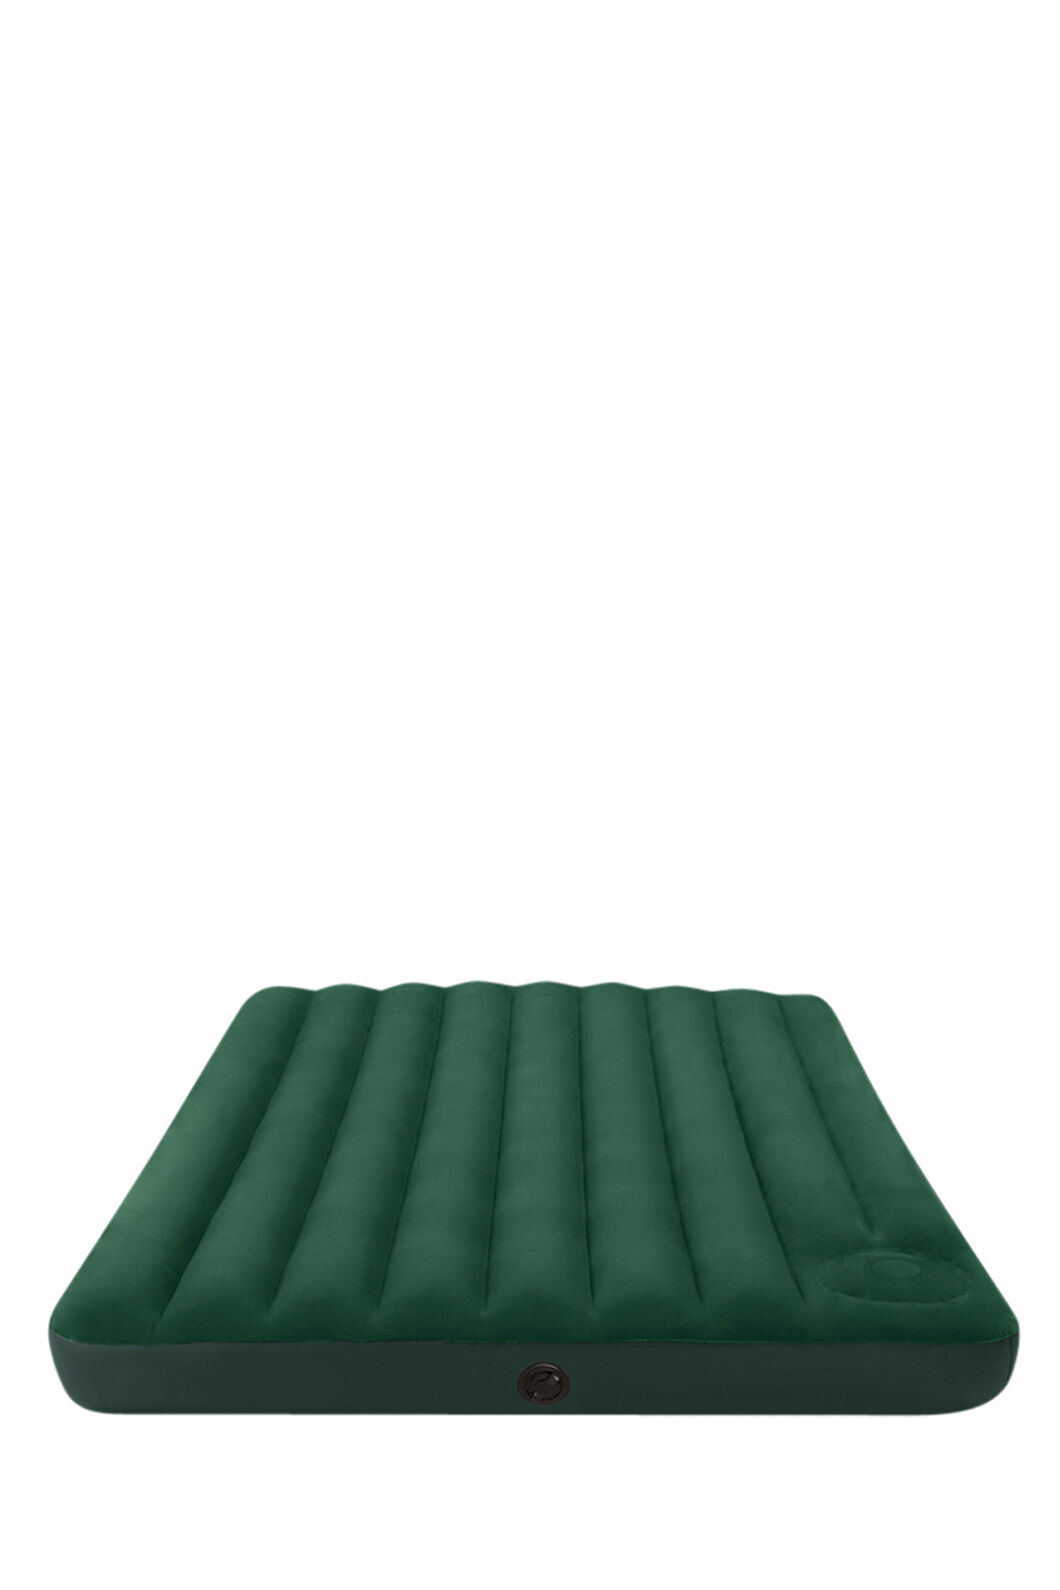 Intex Queen Downy Air Bed with Foot Pump, None, hi-res